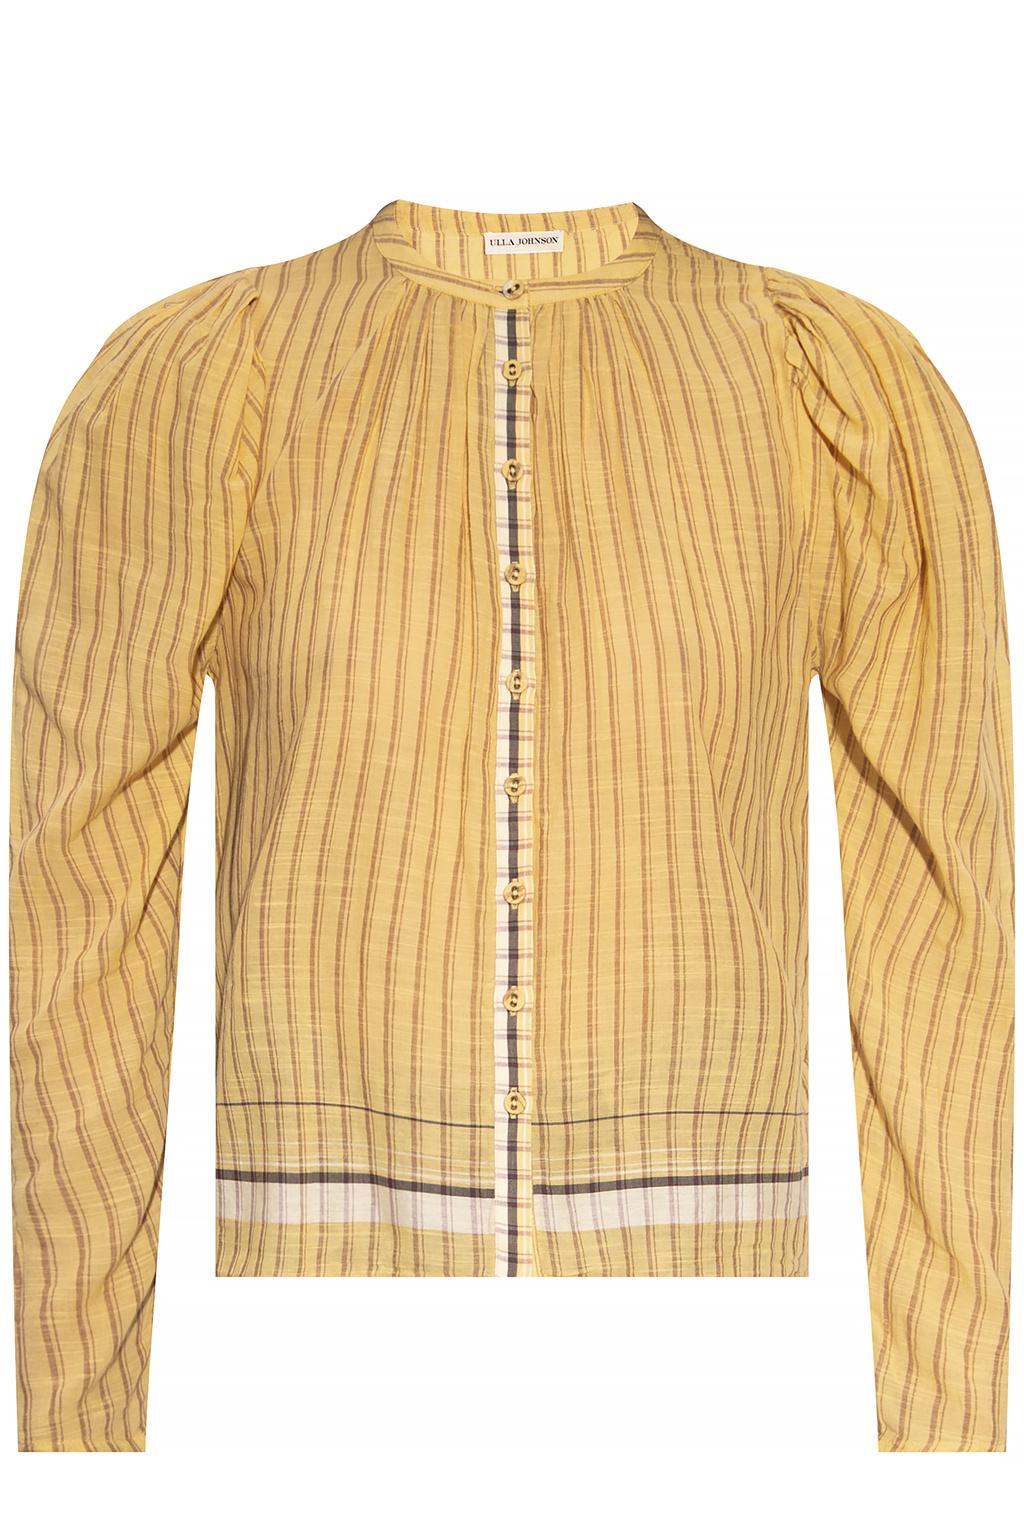 Ulla Johnson Pinstriped shirt